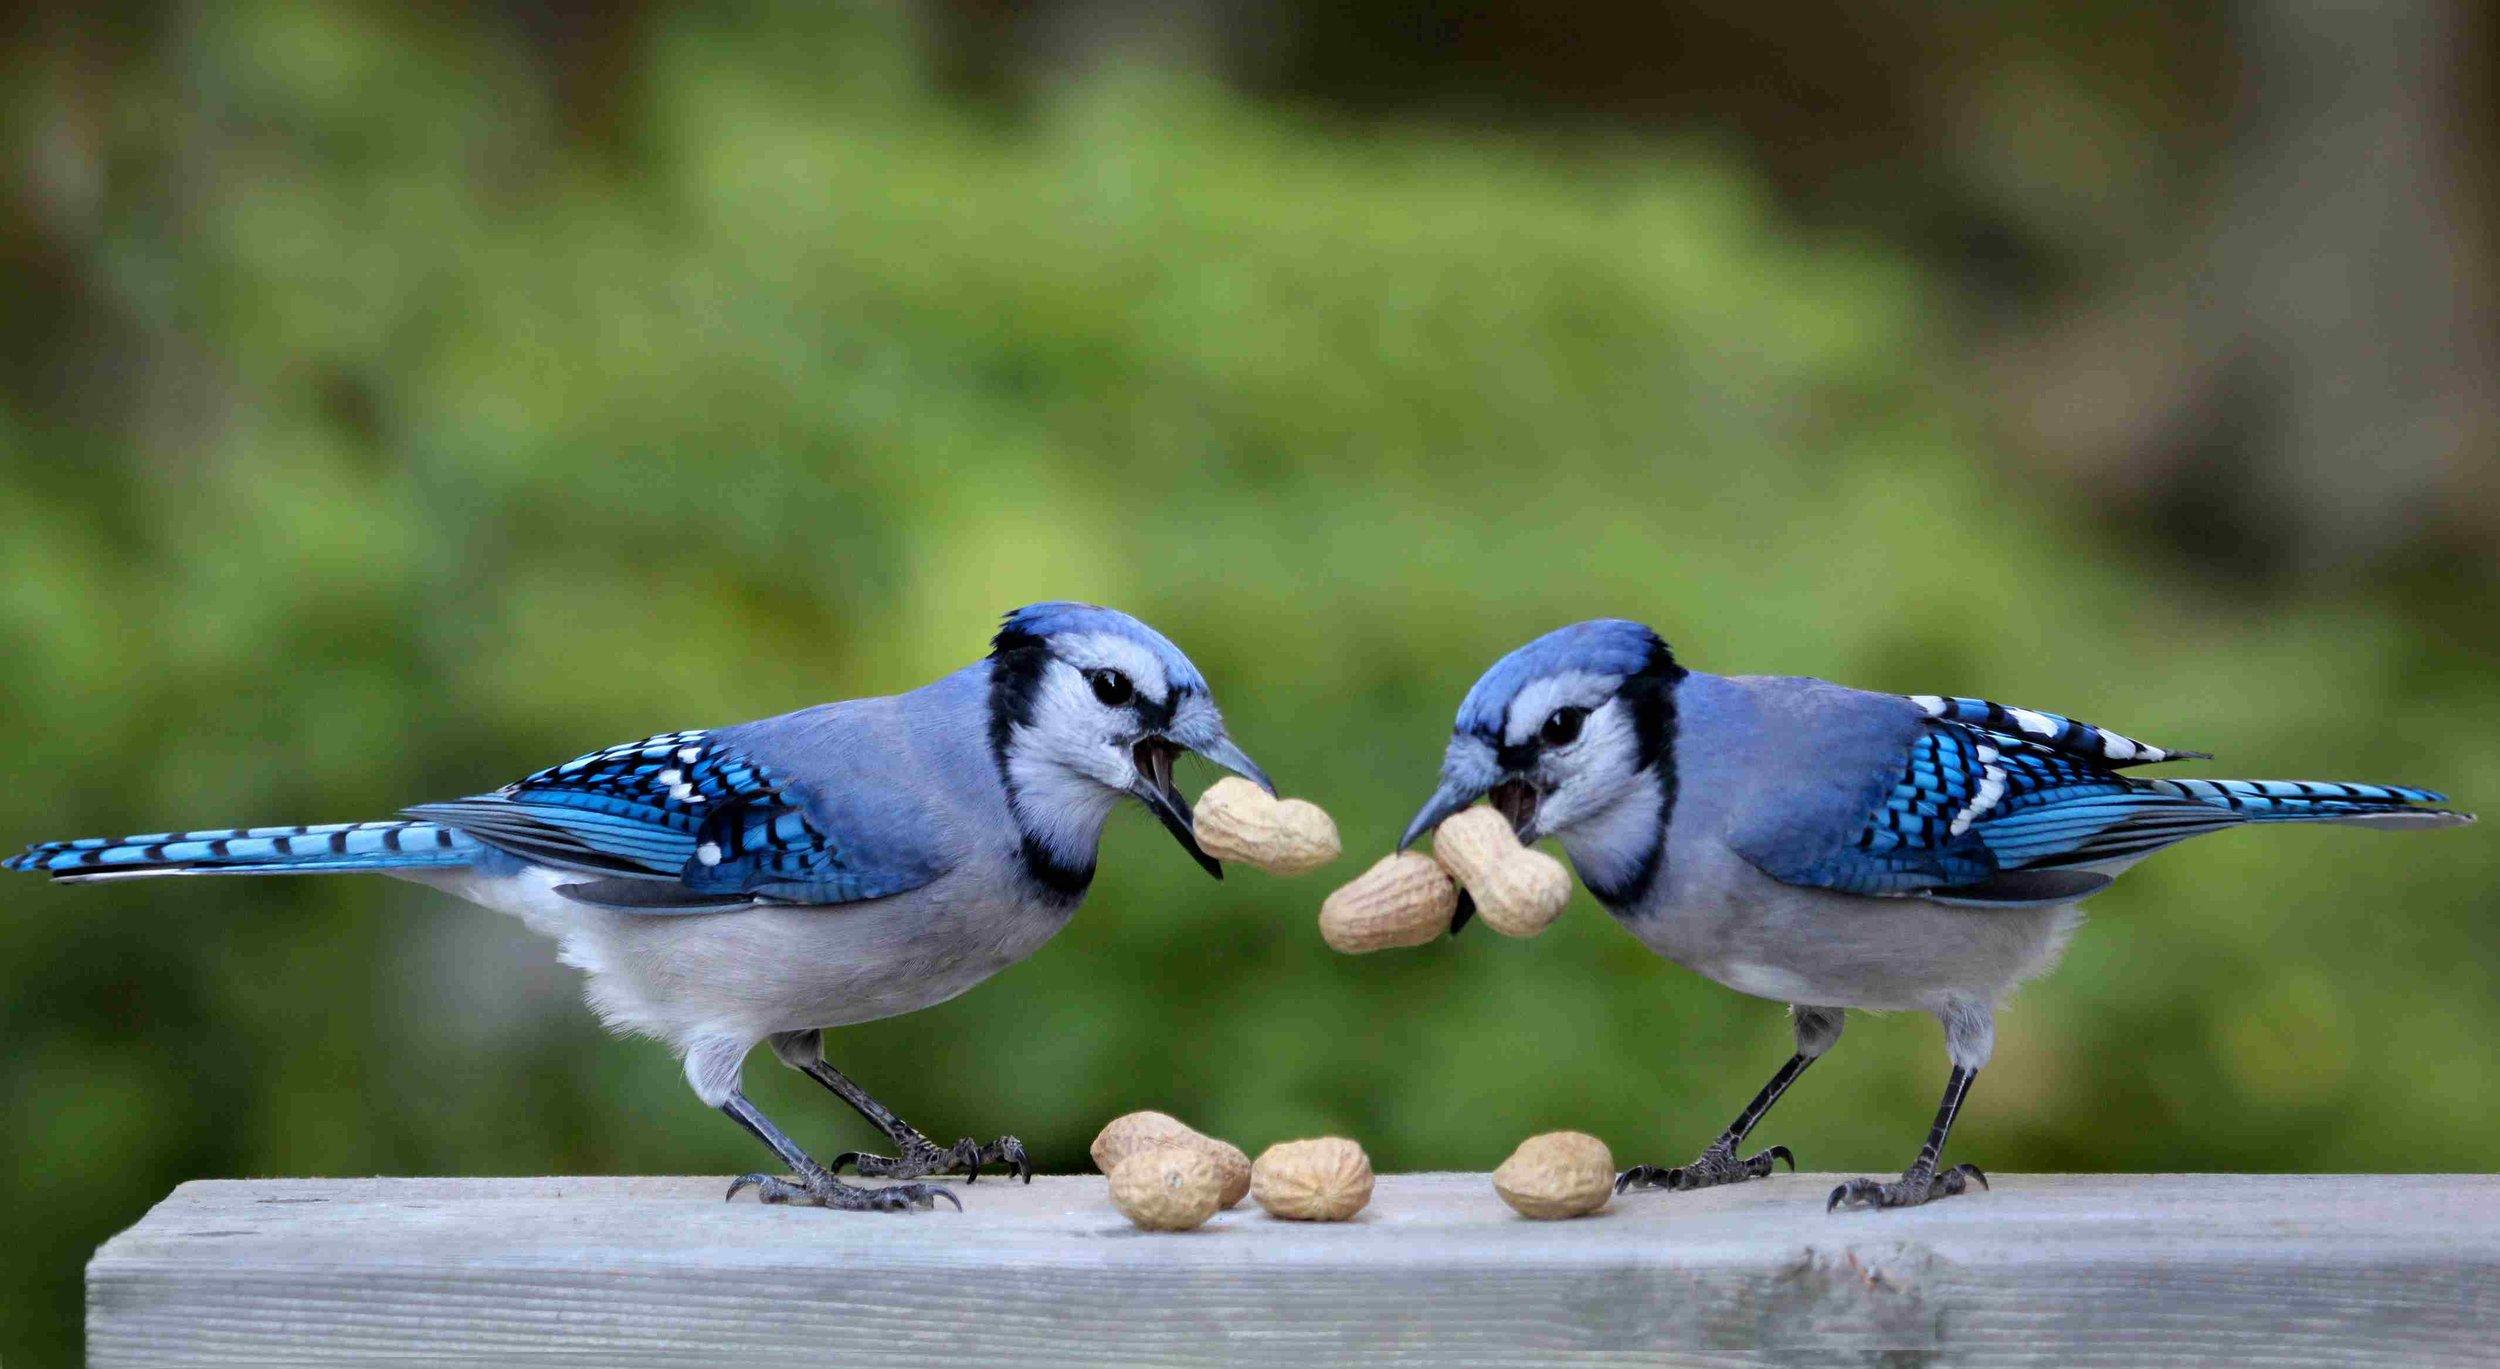 blue jay eating peanut.jpg